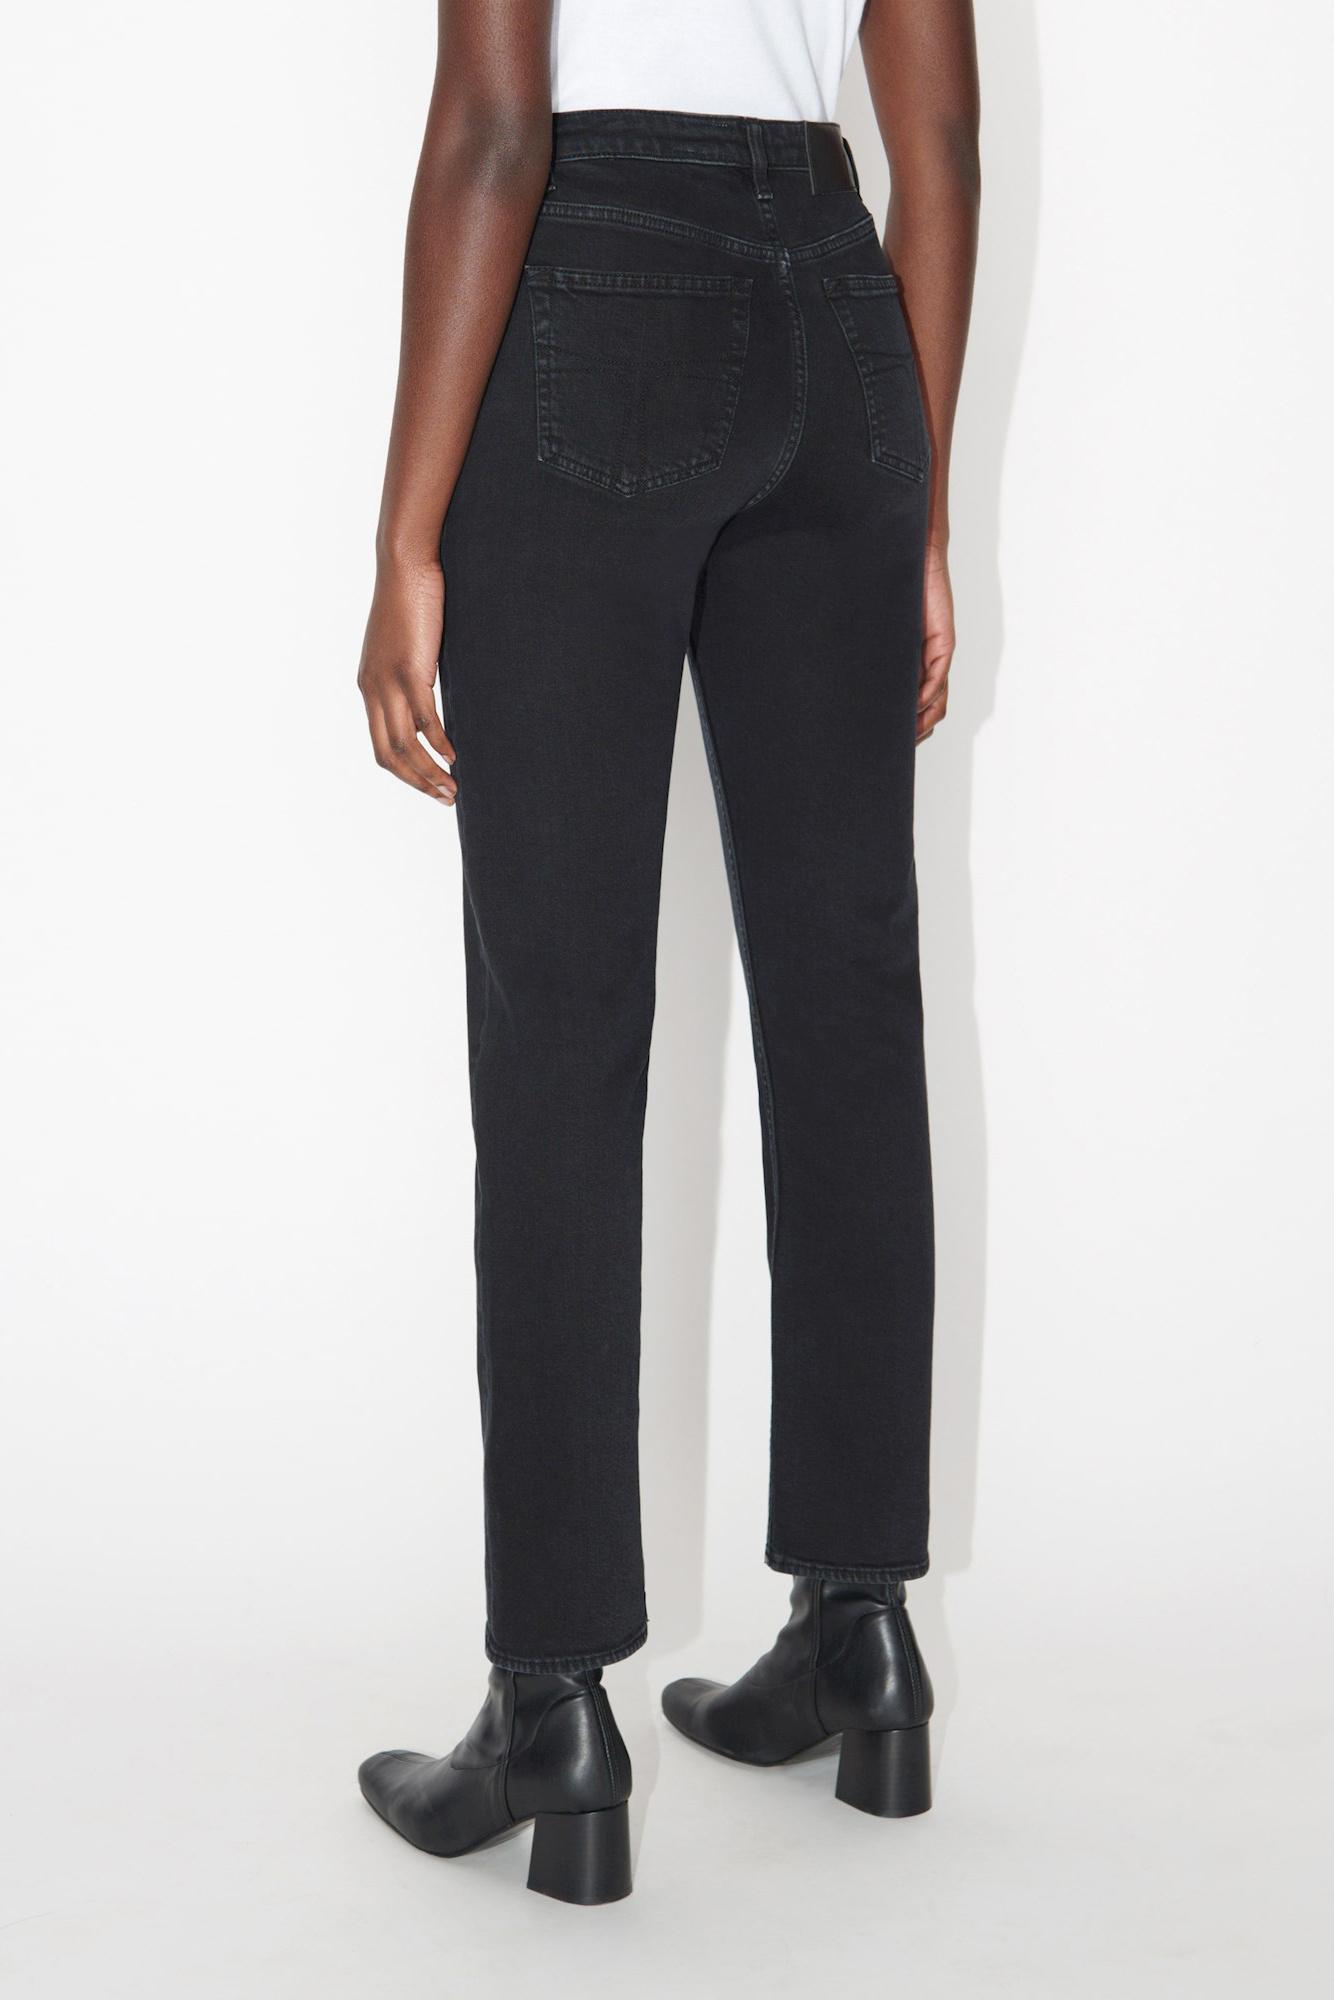 Meg Jeans - Black-3